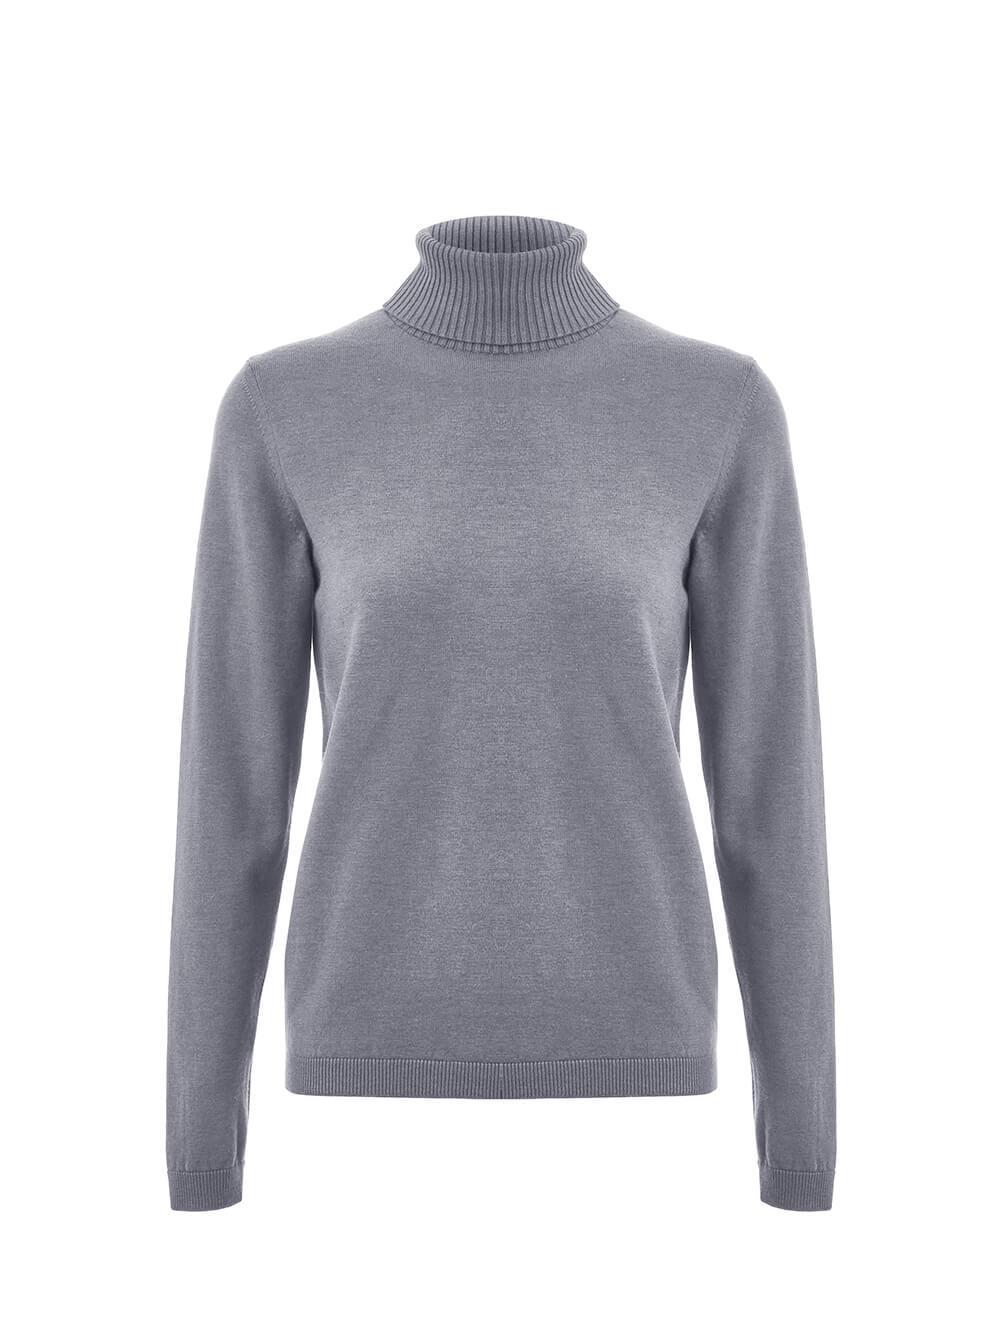 Женский свитер серого цвета из шерсти и шелка - фото 1